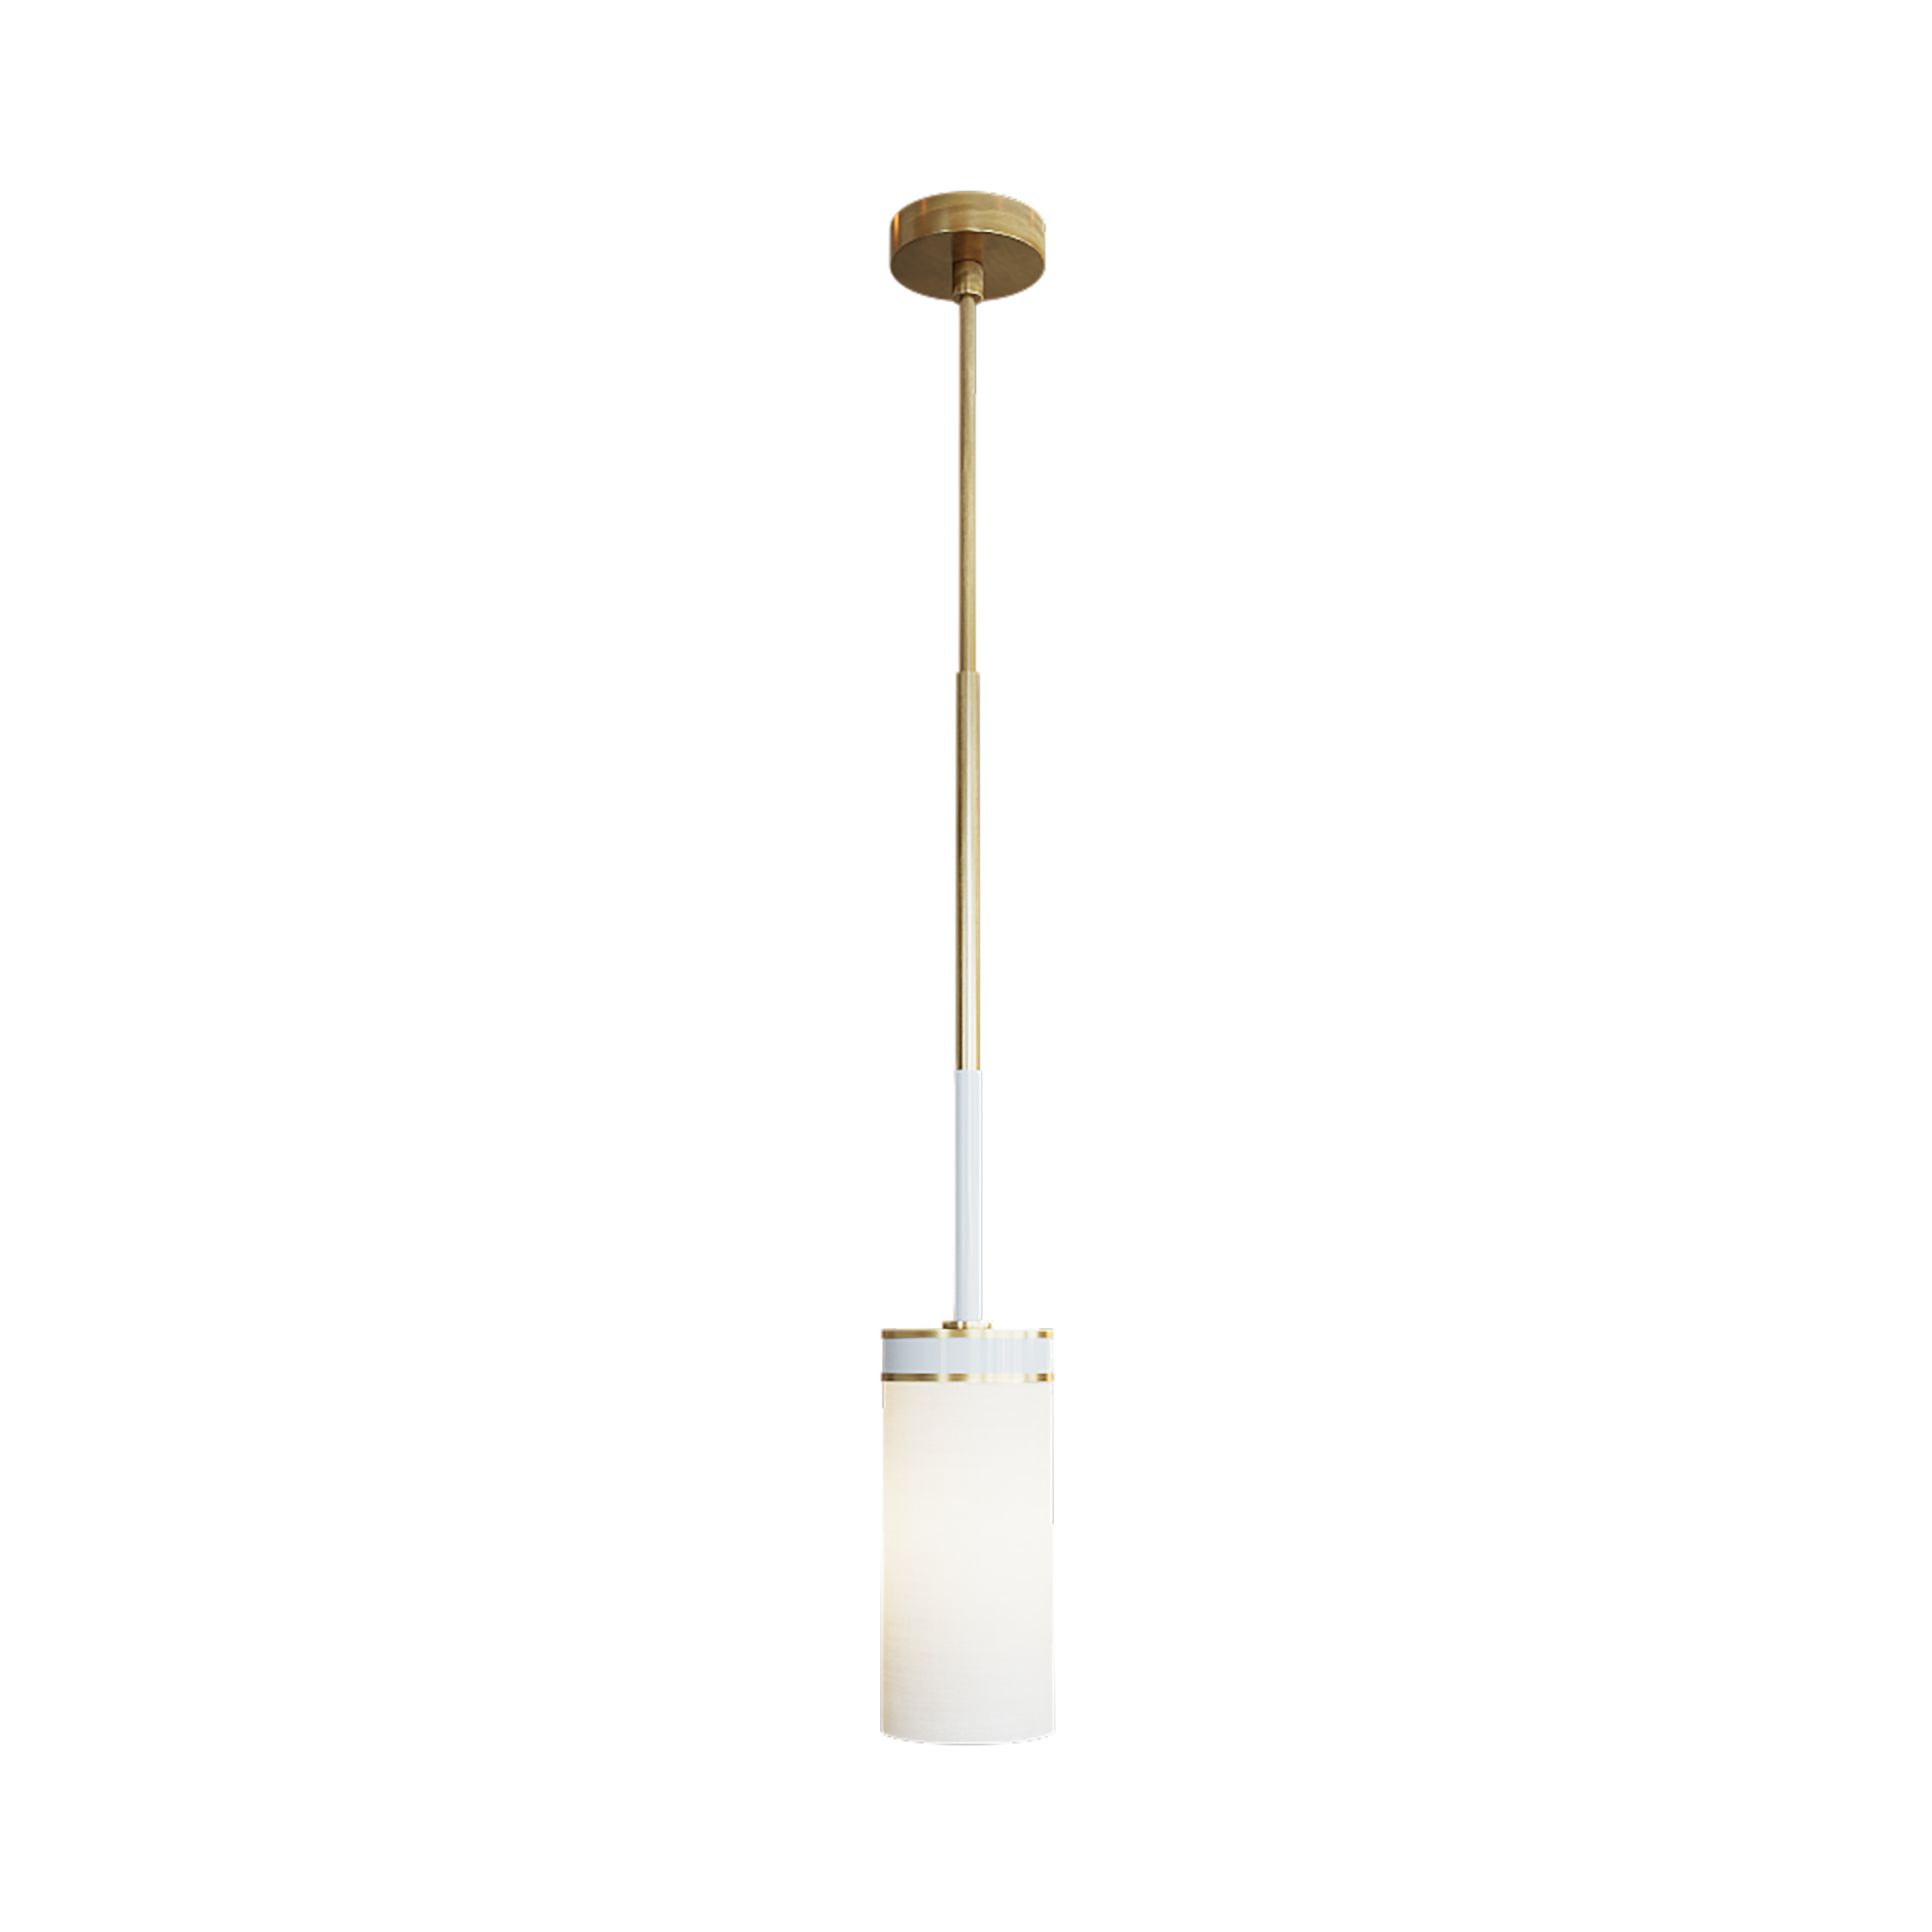 Подвесной светильник Any-Home SP005 - SP005 | AnyHome.ru